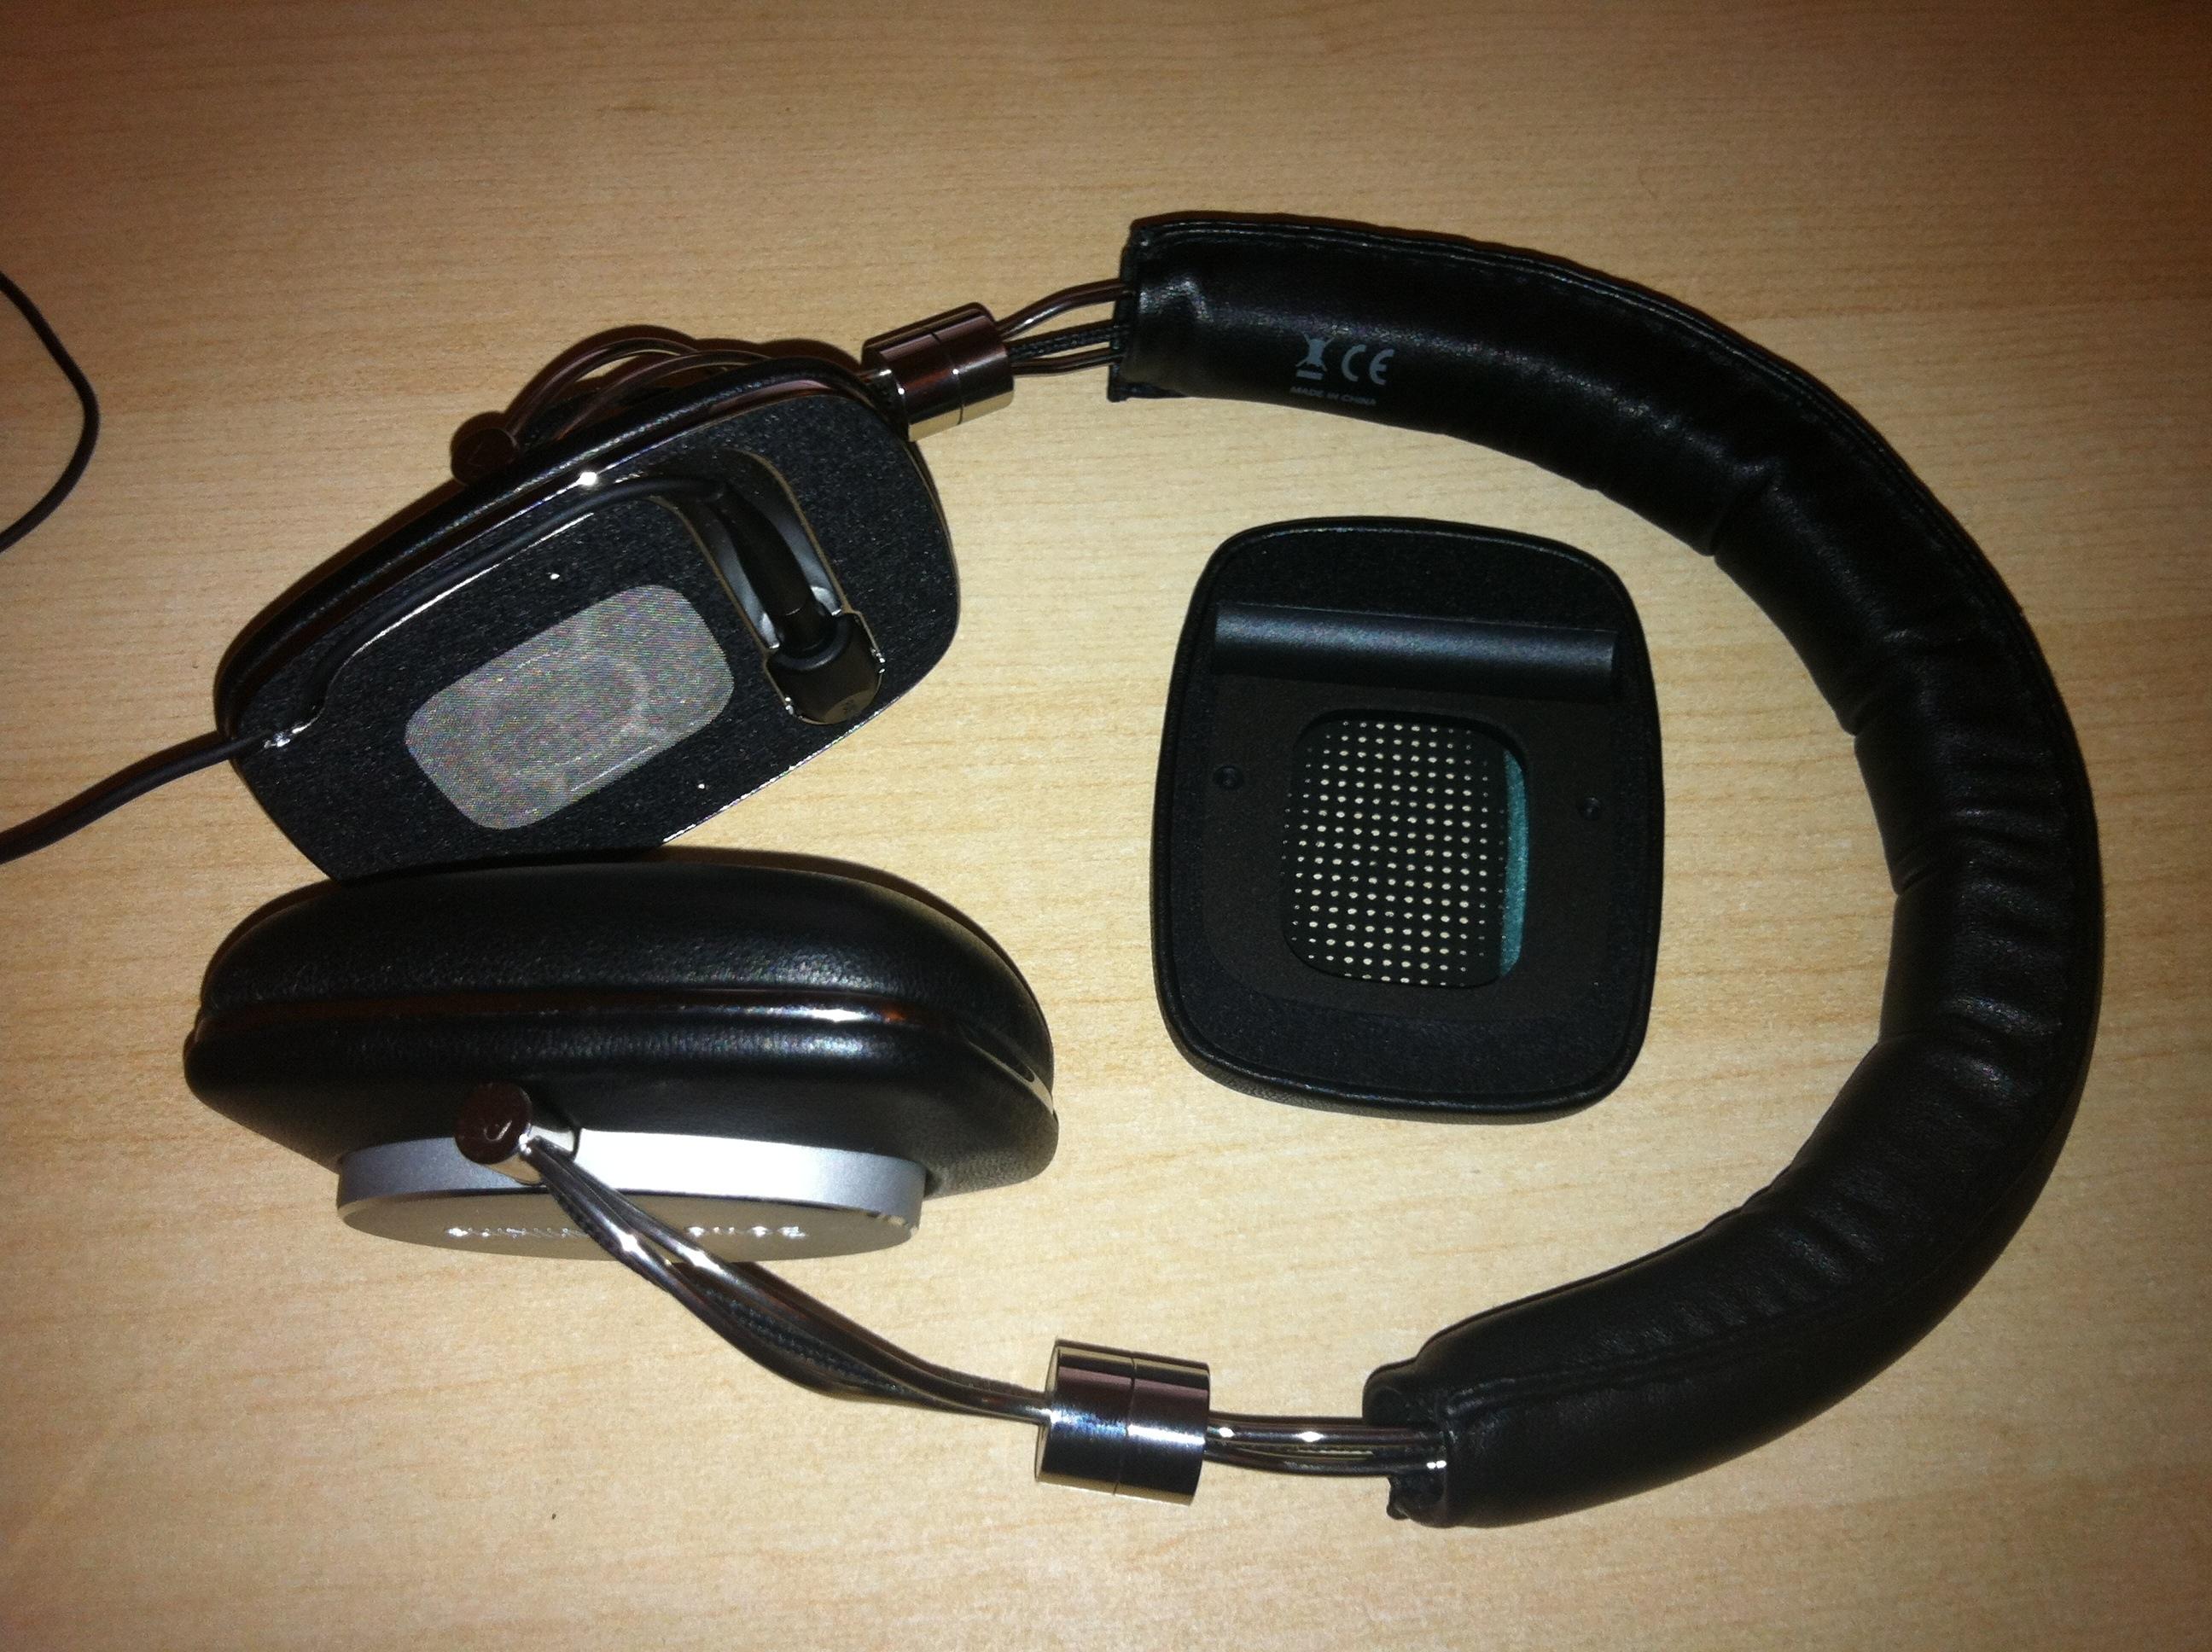 B&W P5 ear cushion mod | Headphone Reviews and Discussion